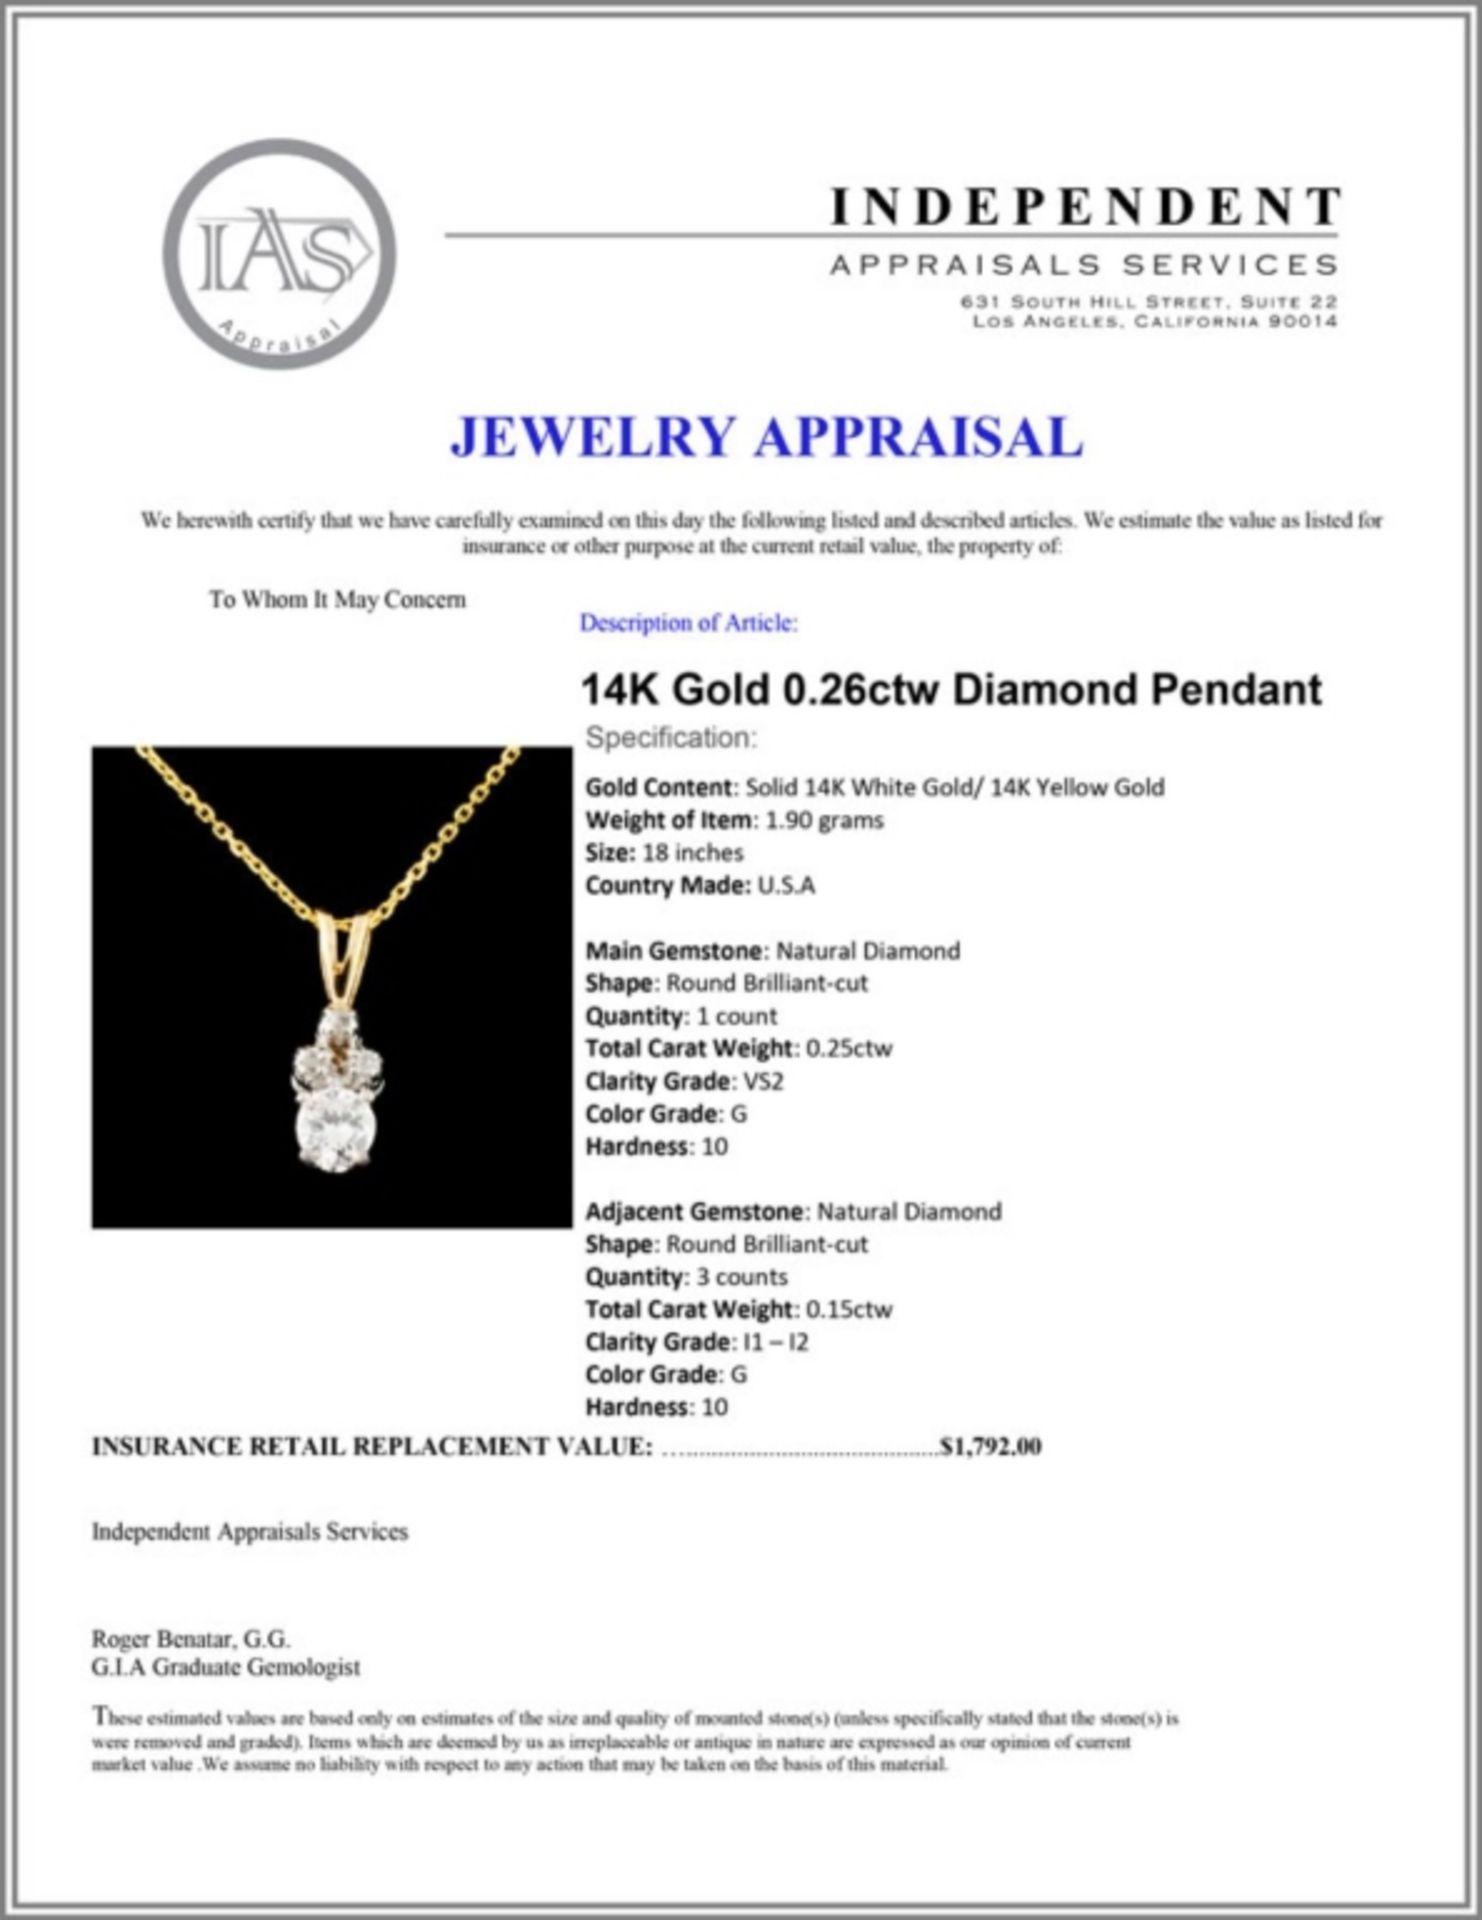 14K Gold 0.26ctw Diamond Pendant - Image 4 of 4